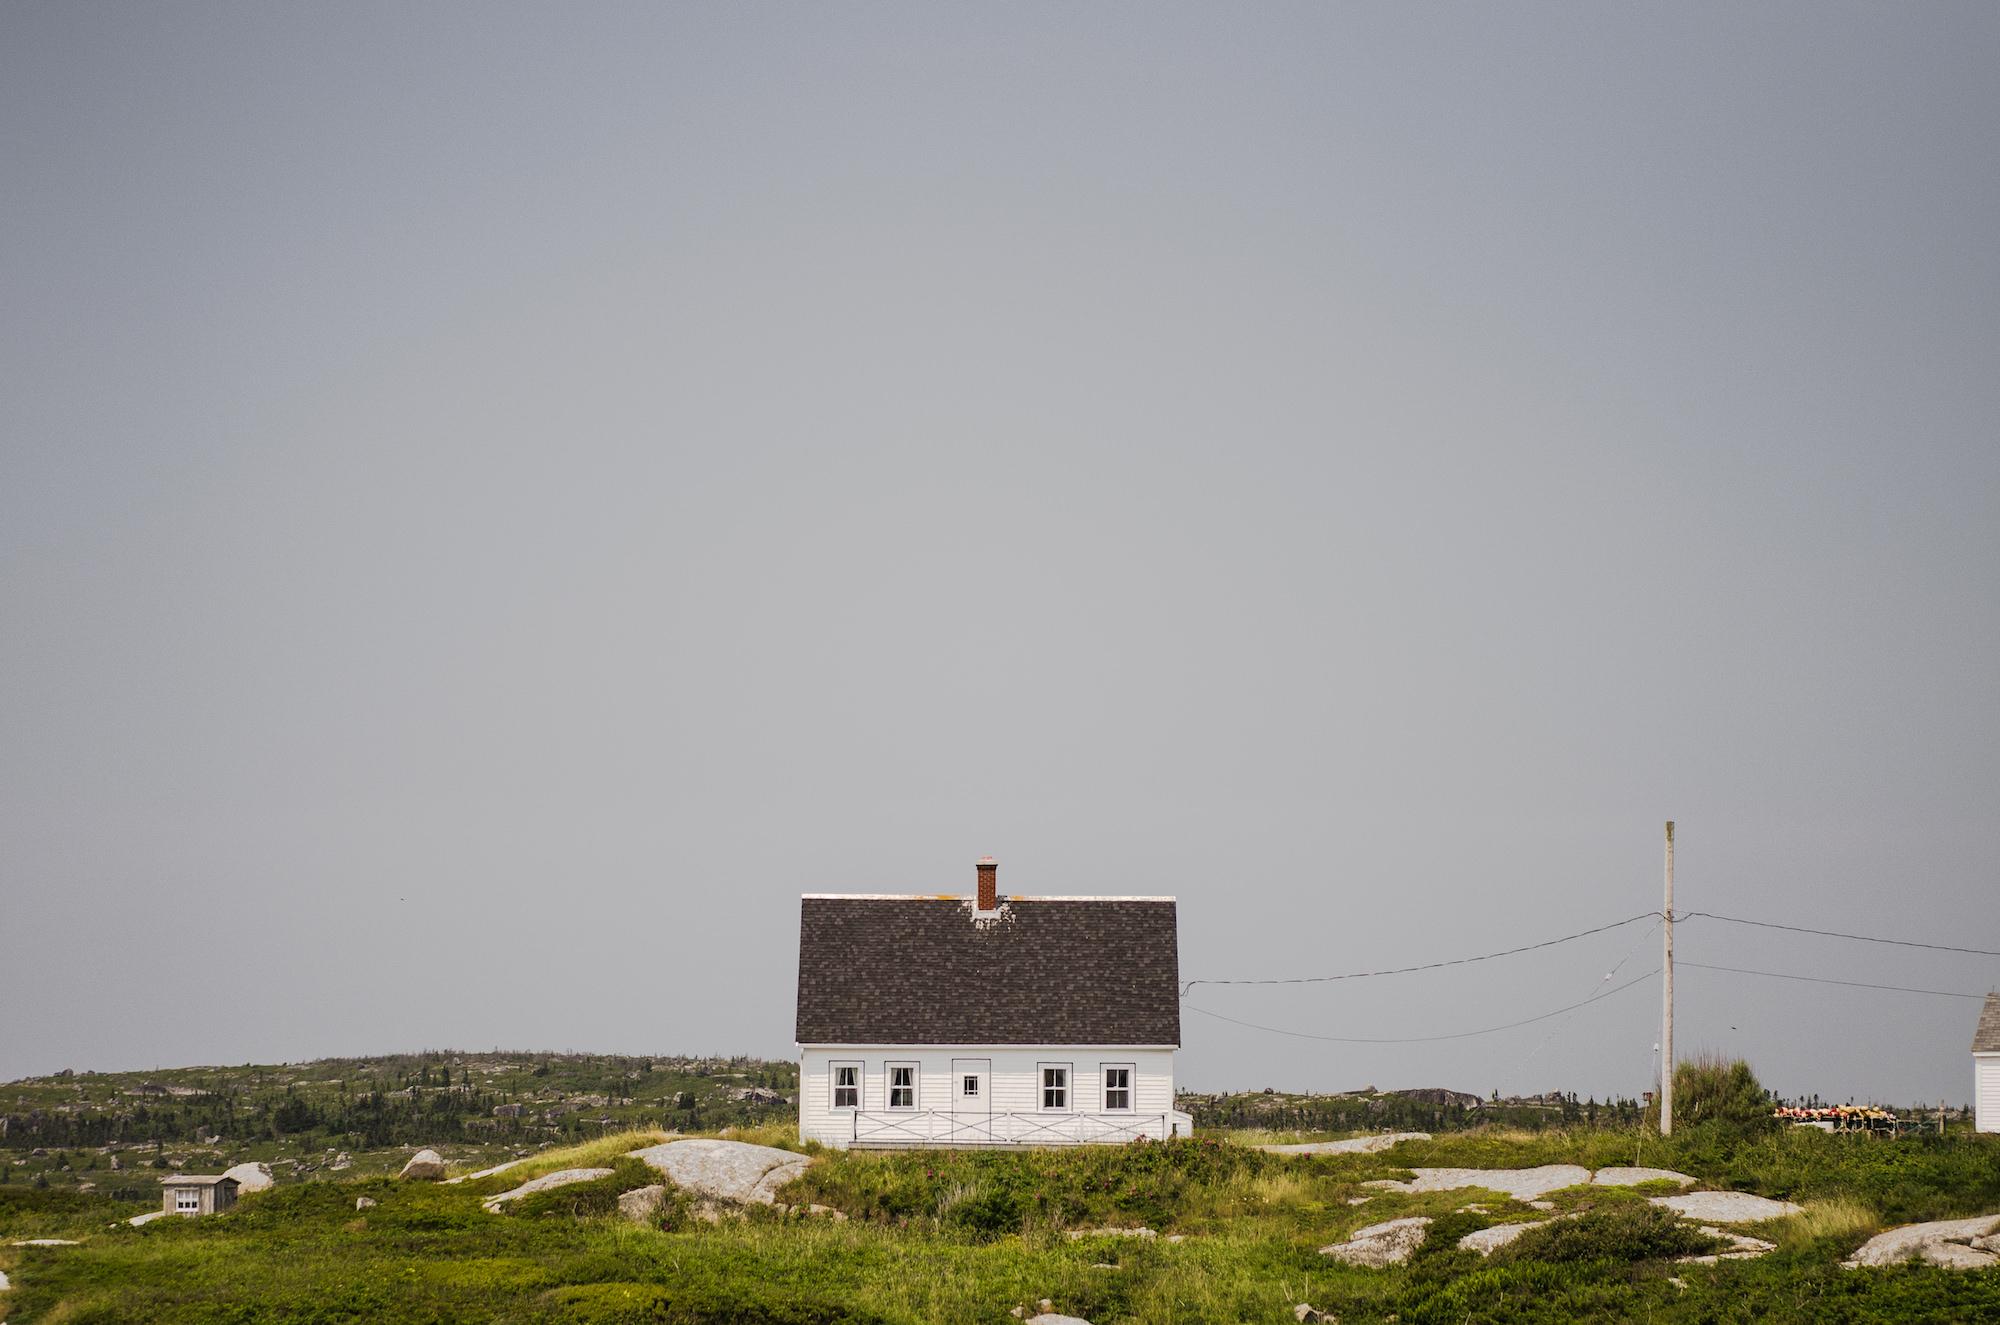 polar-visual-taylor-sheppard-photography-photo-video-motion-design-graphic-newfoundland-nova-scoia-peggy-cove-travel-landscape-nature.jpg